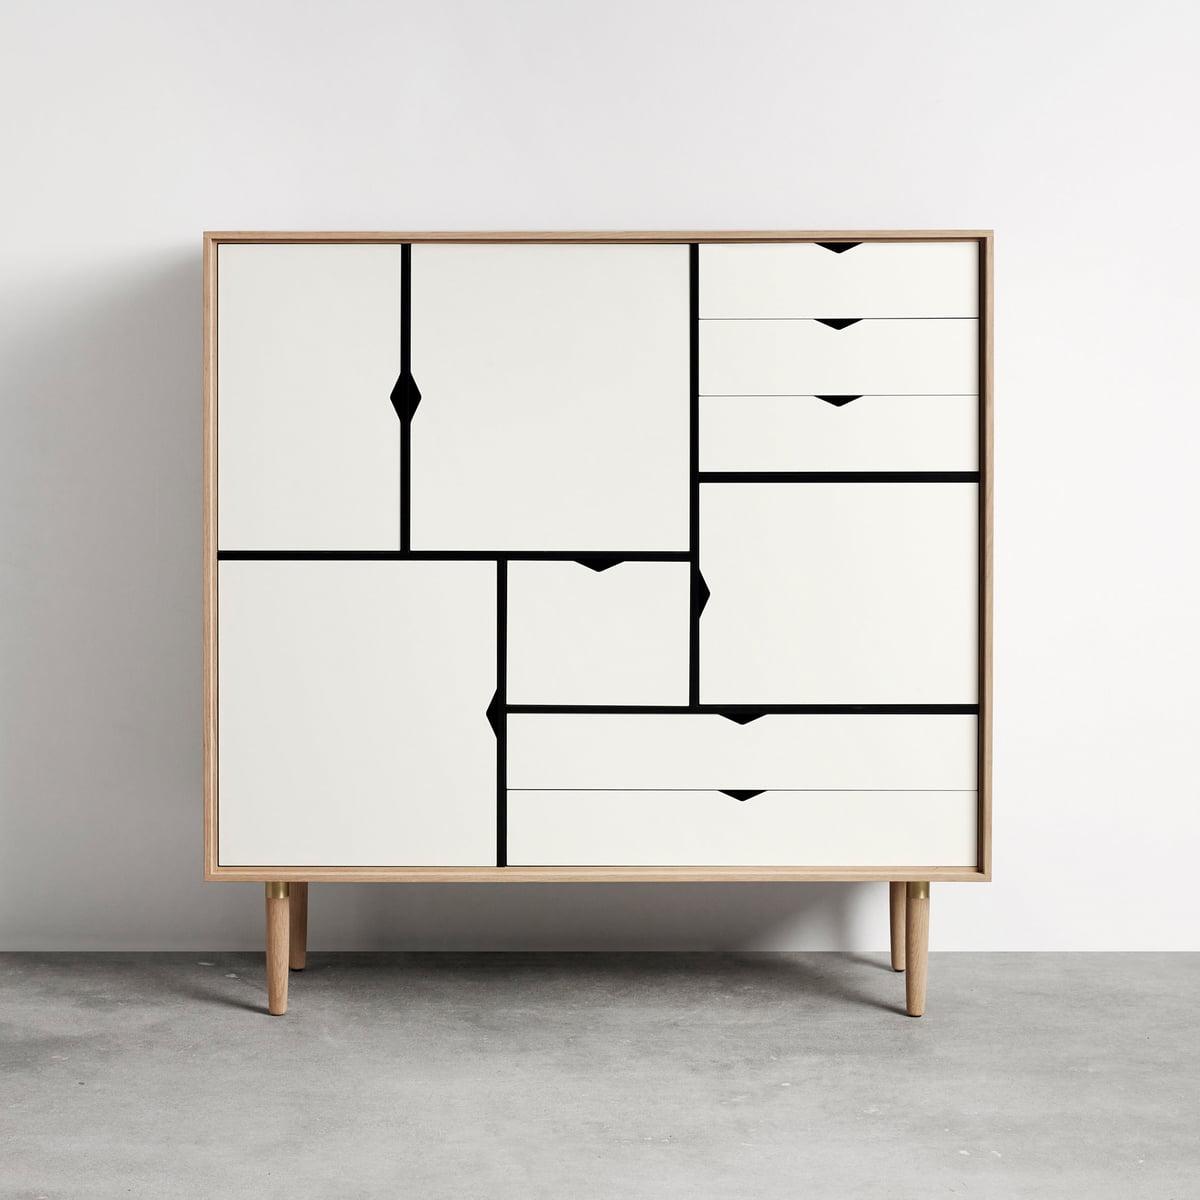 S3 kommode einfarbig von andersen furniture for Kommode 3 meter lang